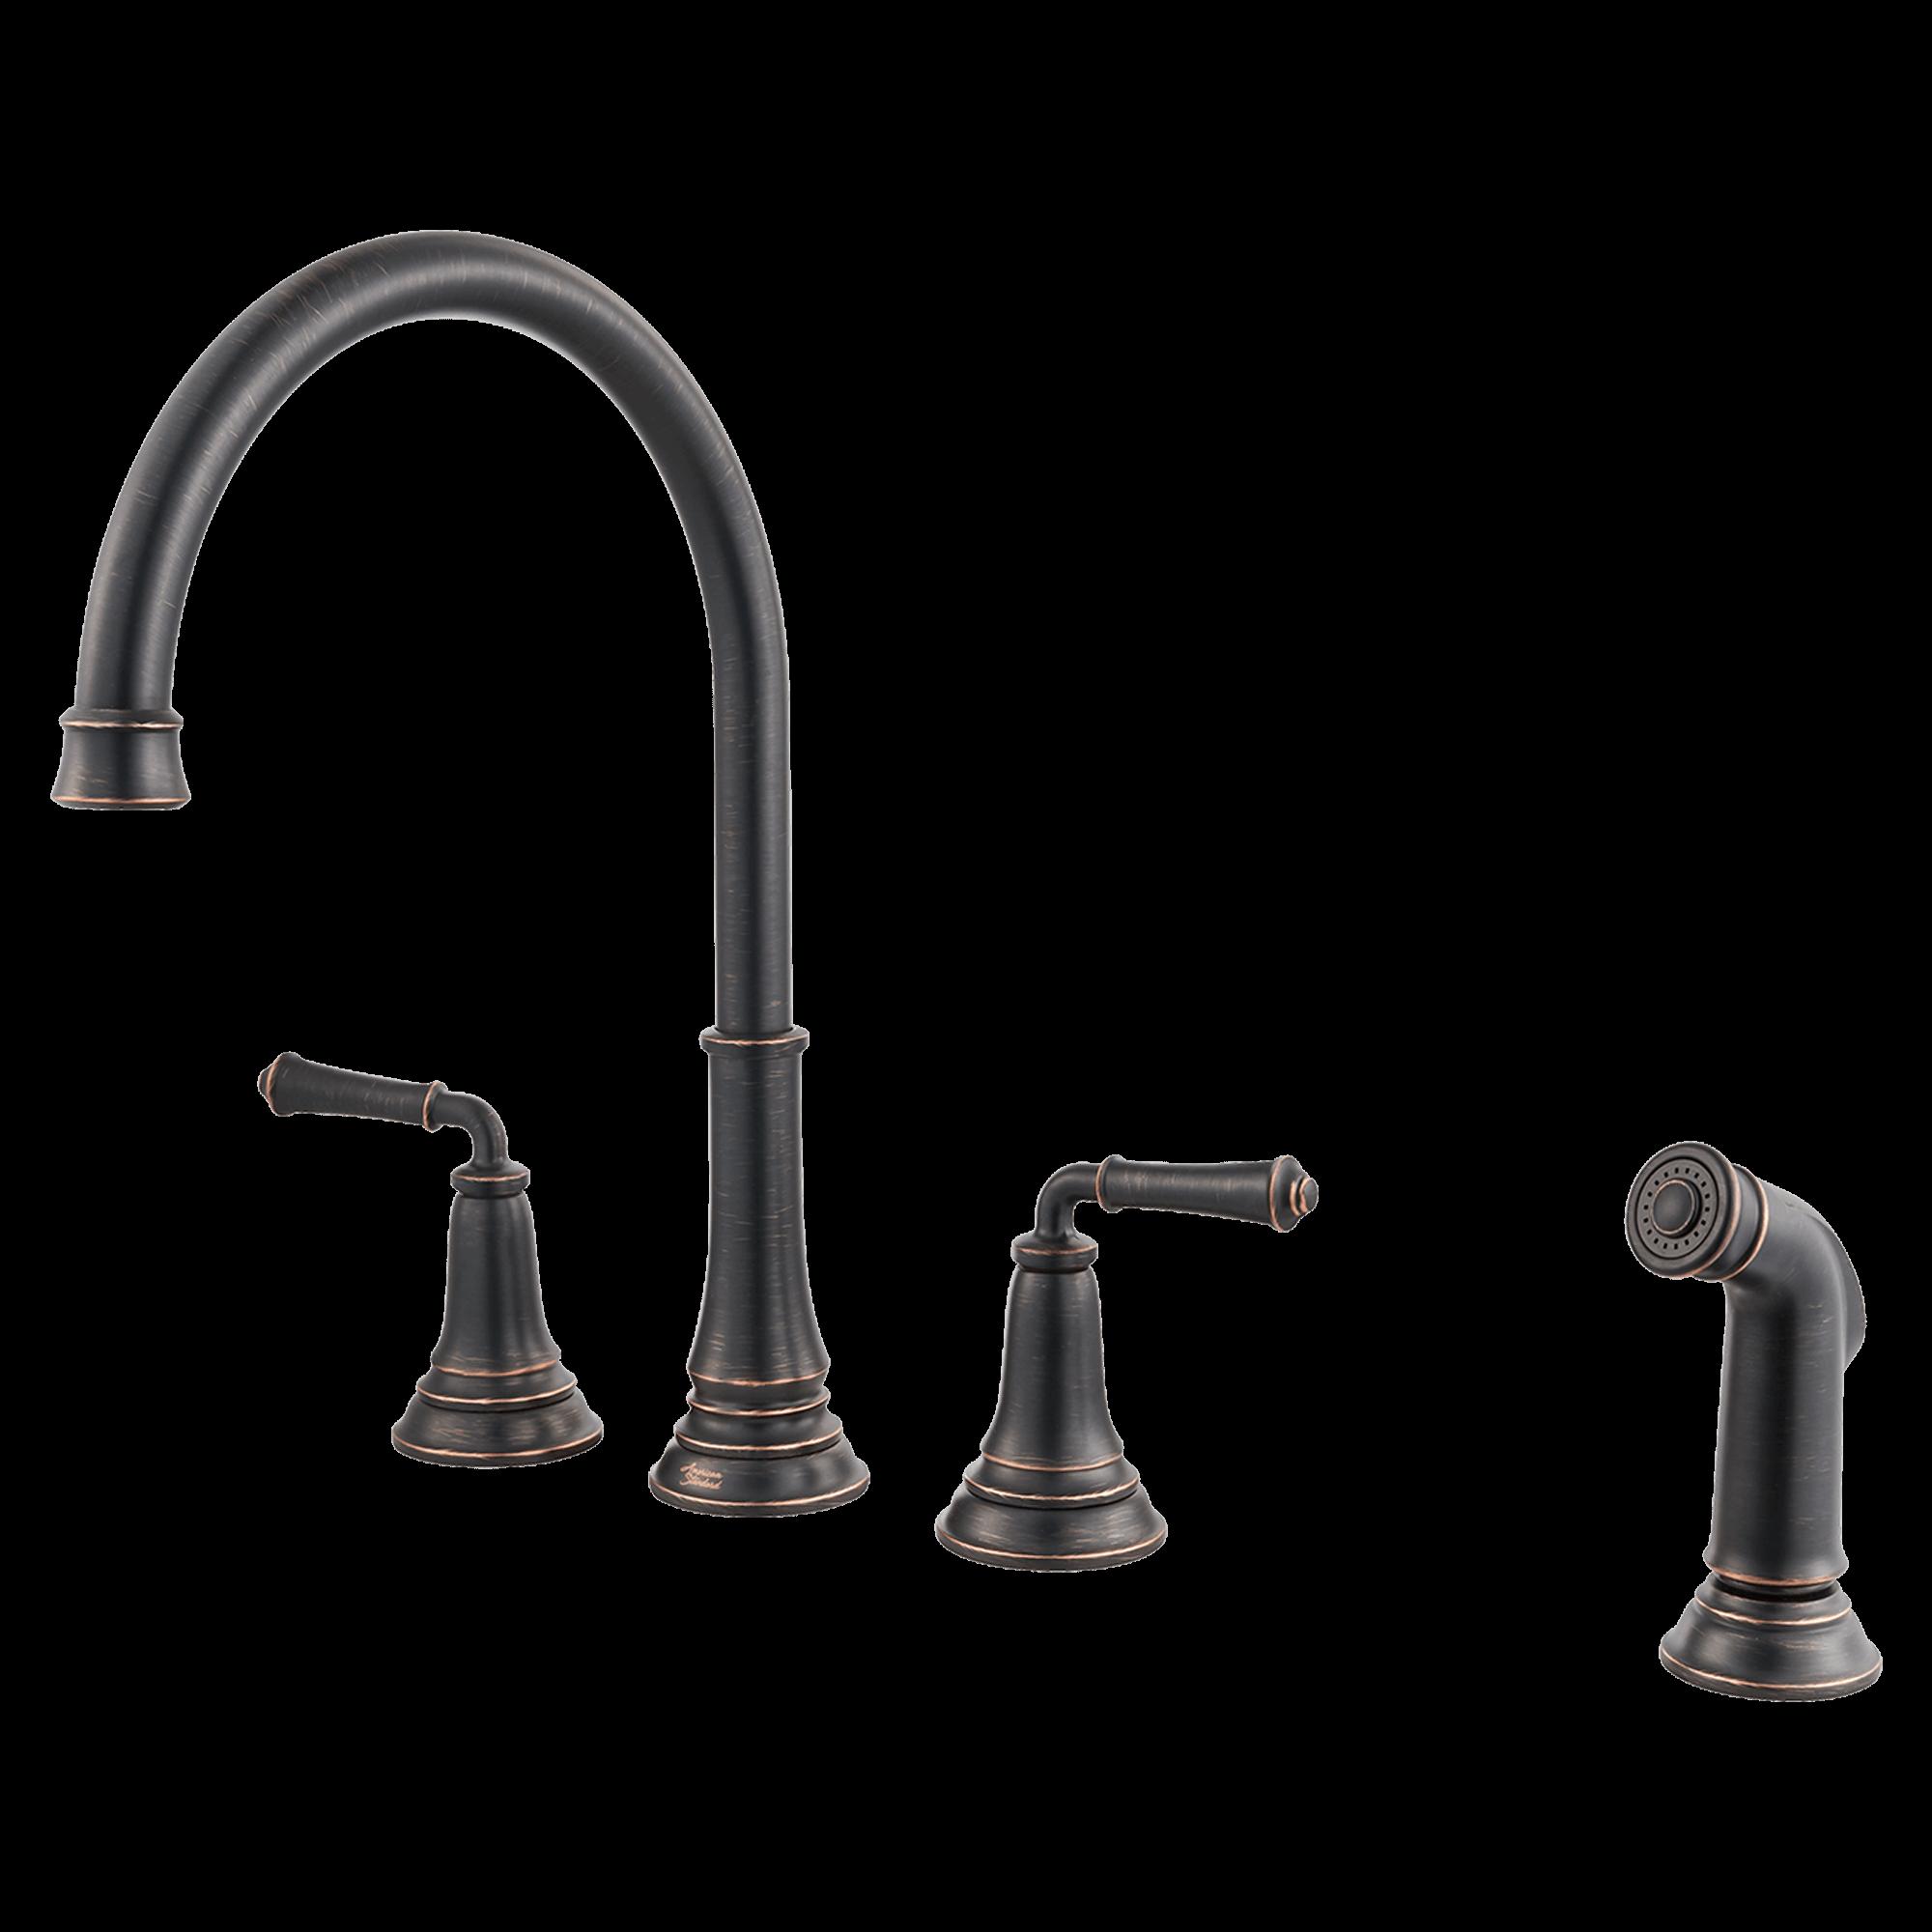 american standard kitchen faucet outdoor design software delancey widespread